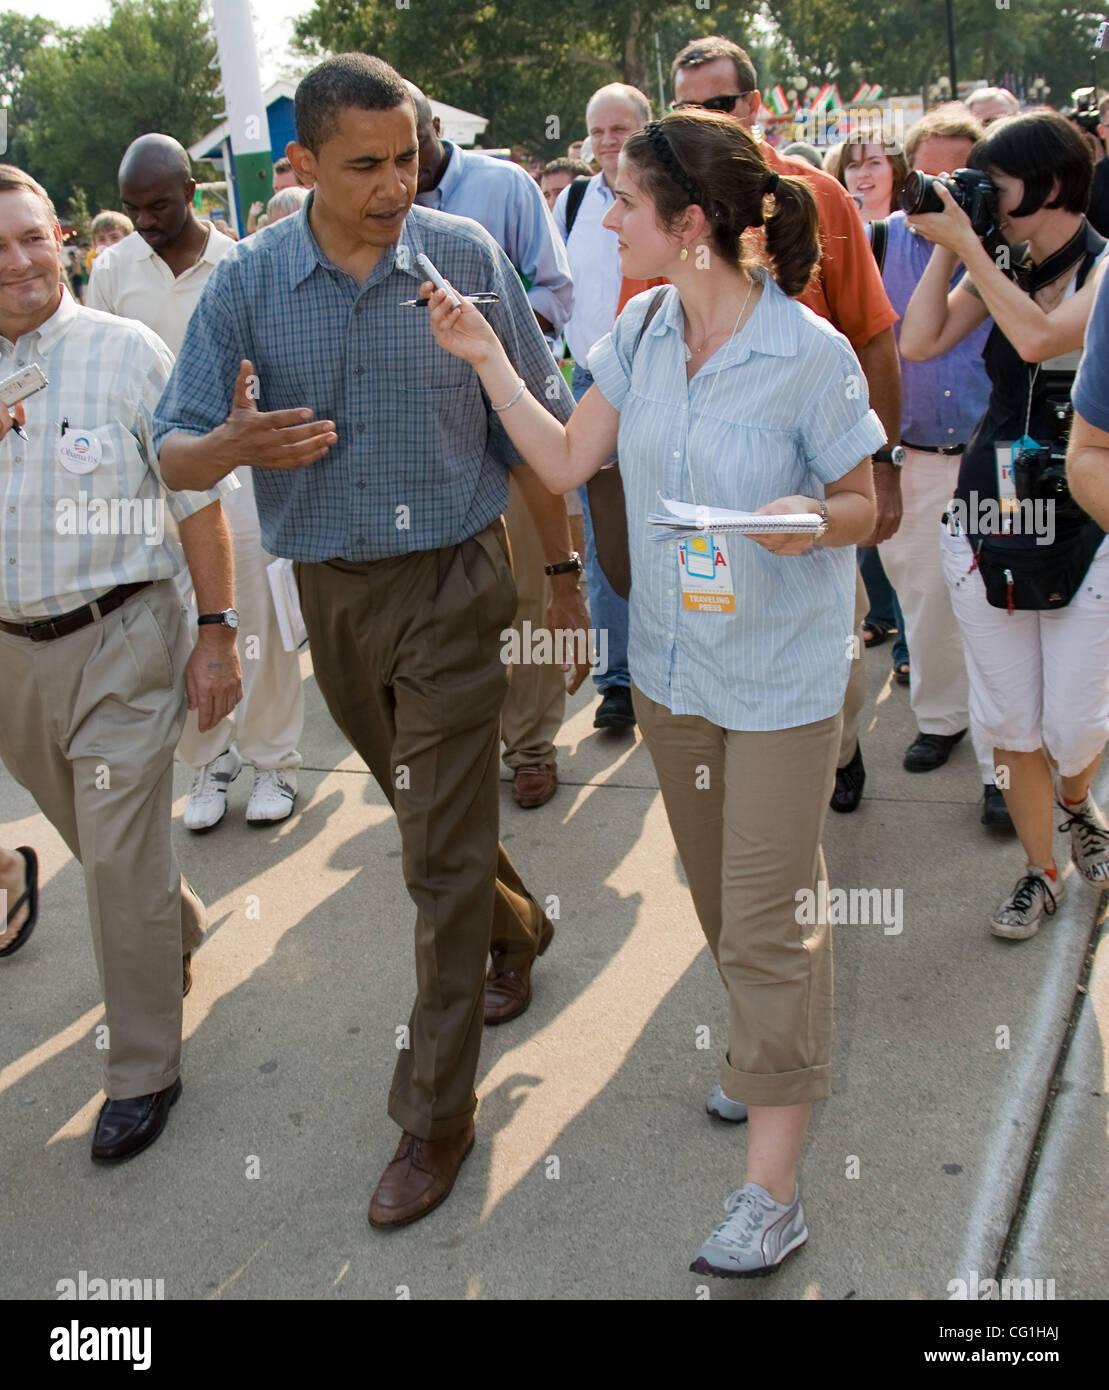 Aug 16, 2007 - Des Moines, IA, USA - Democratic presidential hopeful Senator BARACK OBAMA (D-Illinois) is interviewed - Stock Image